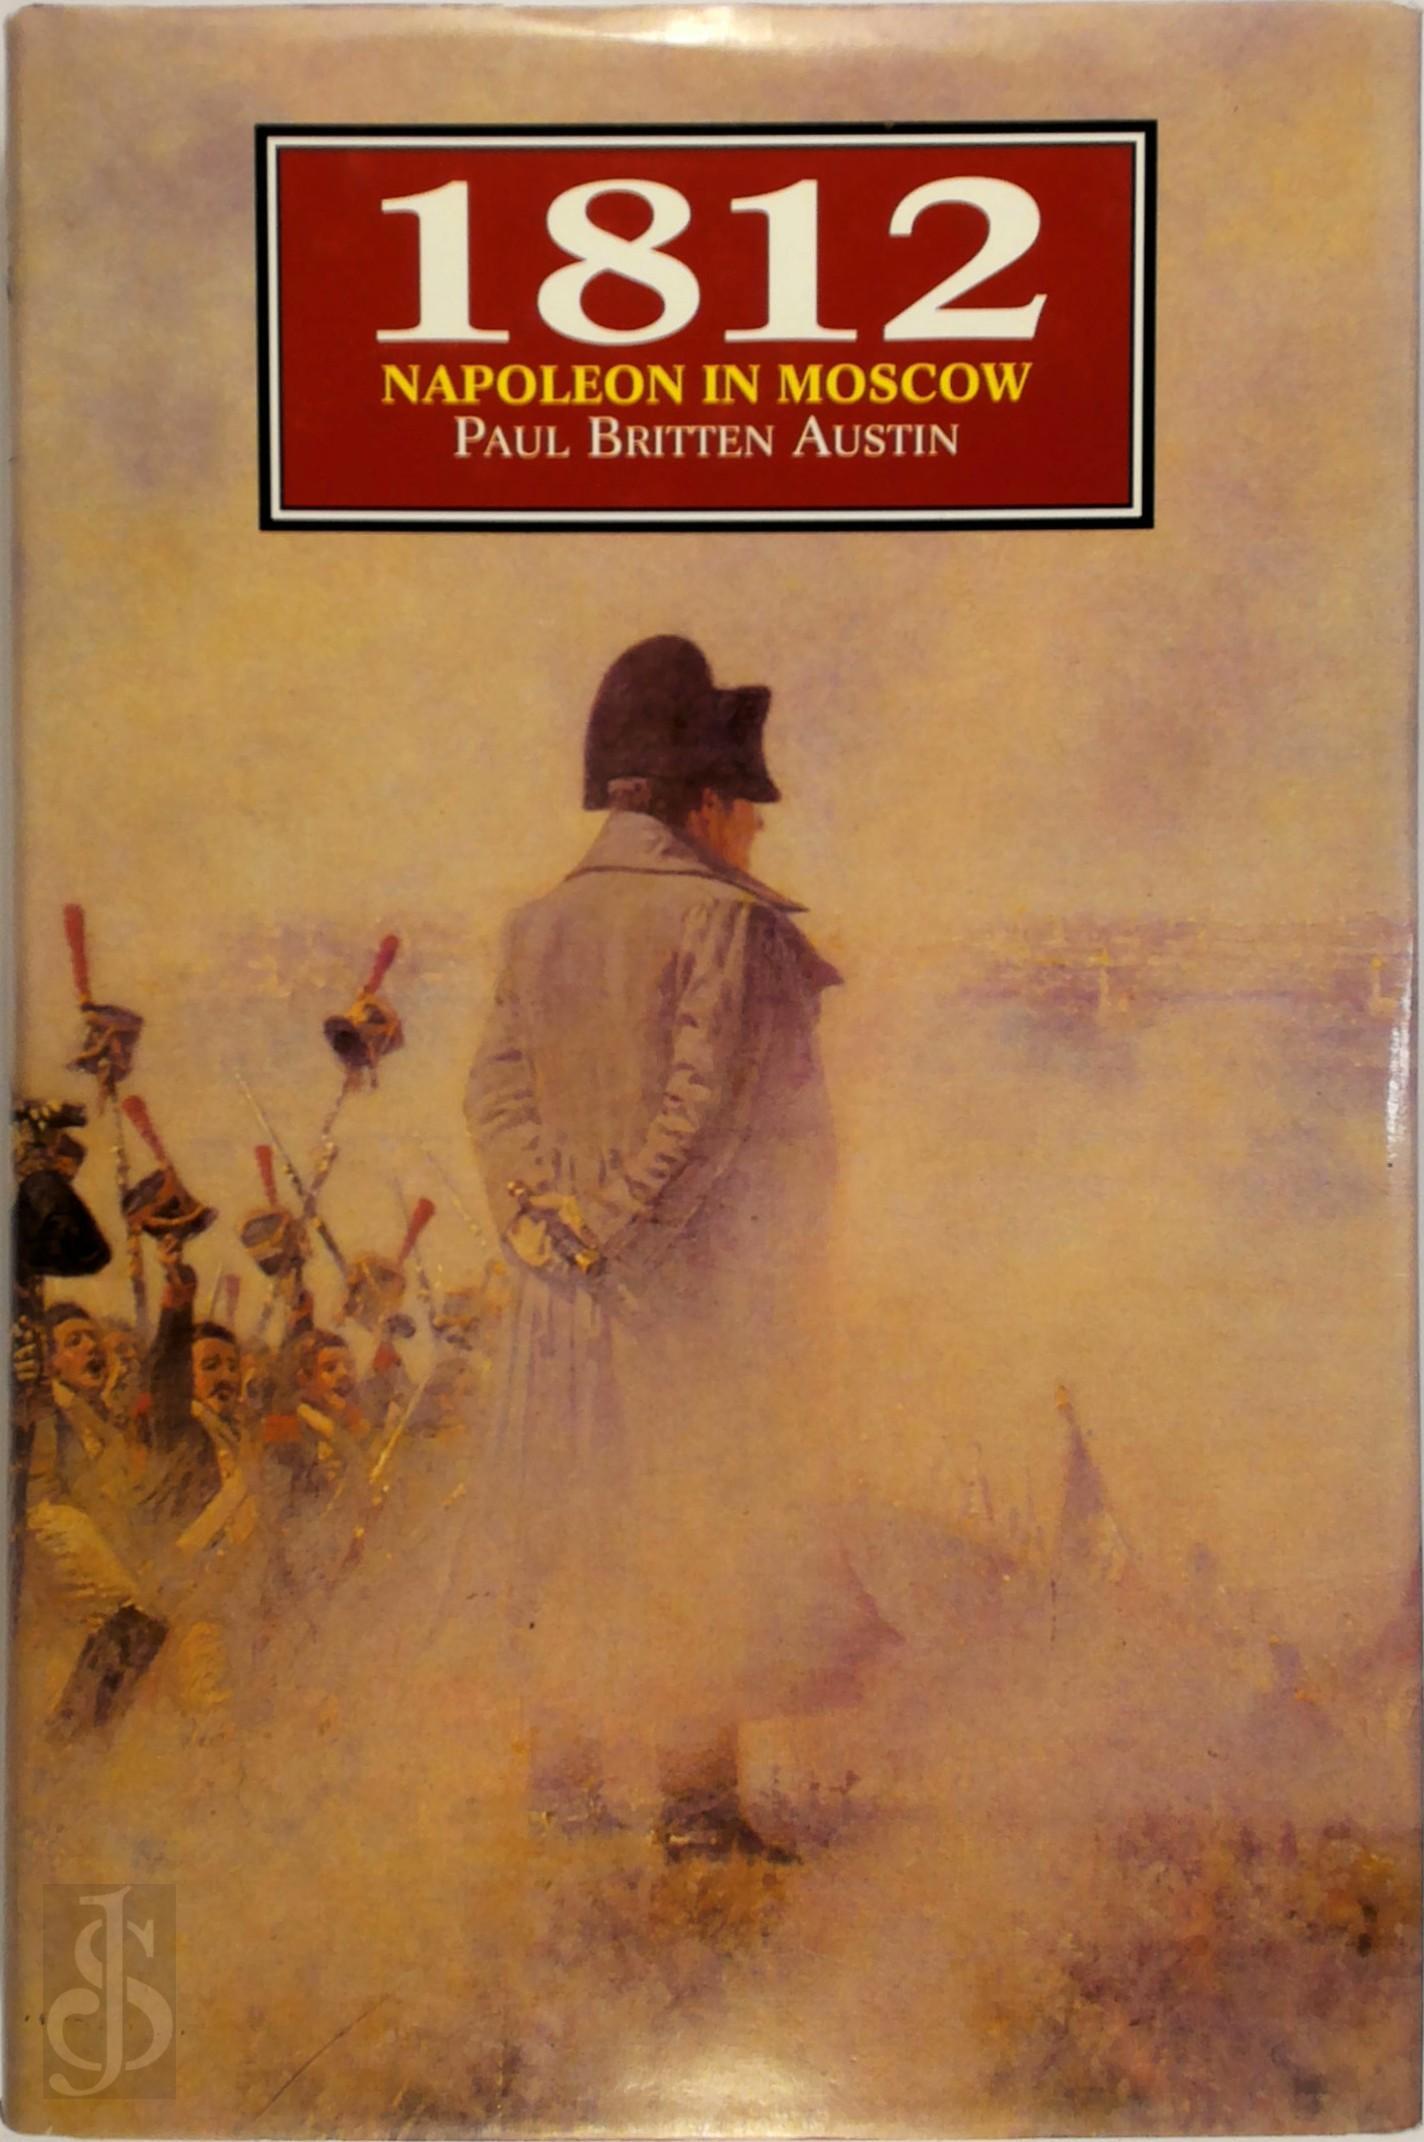 Paul Britten Austin - 1812